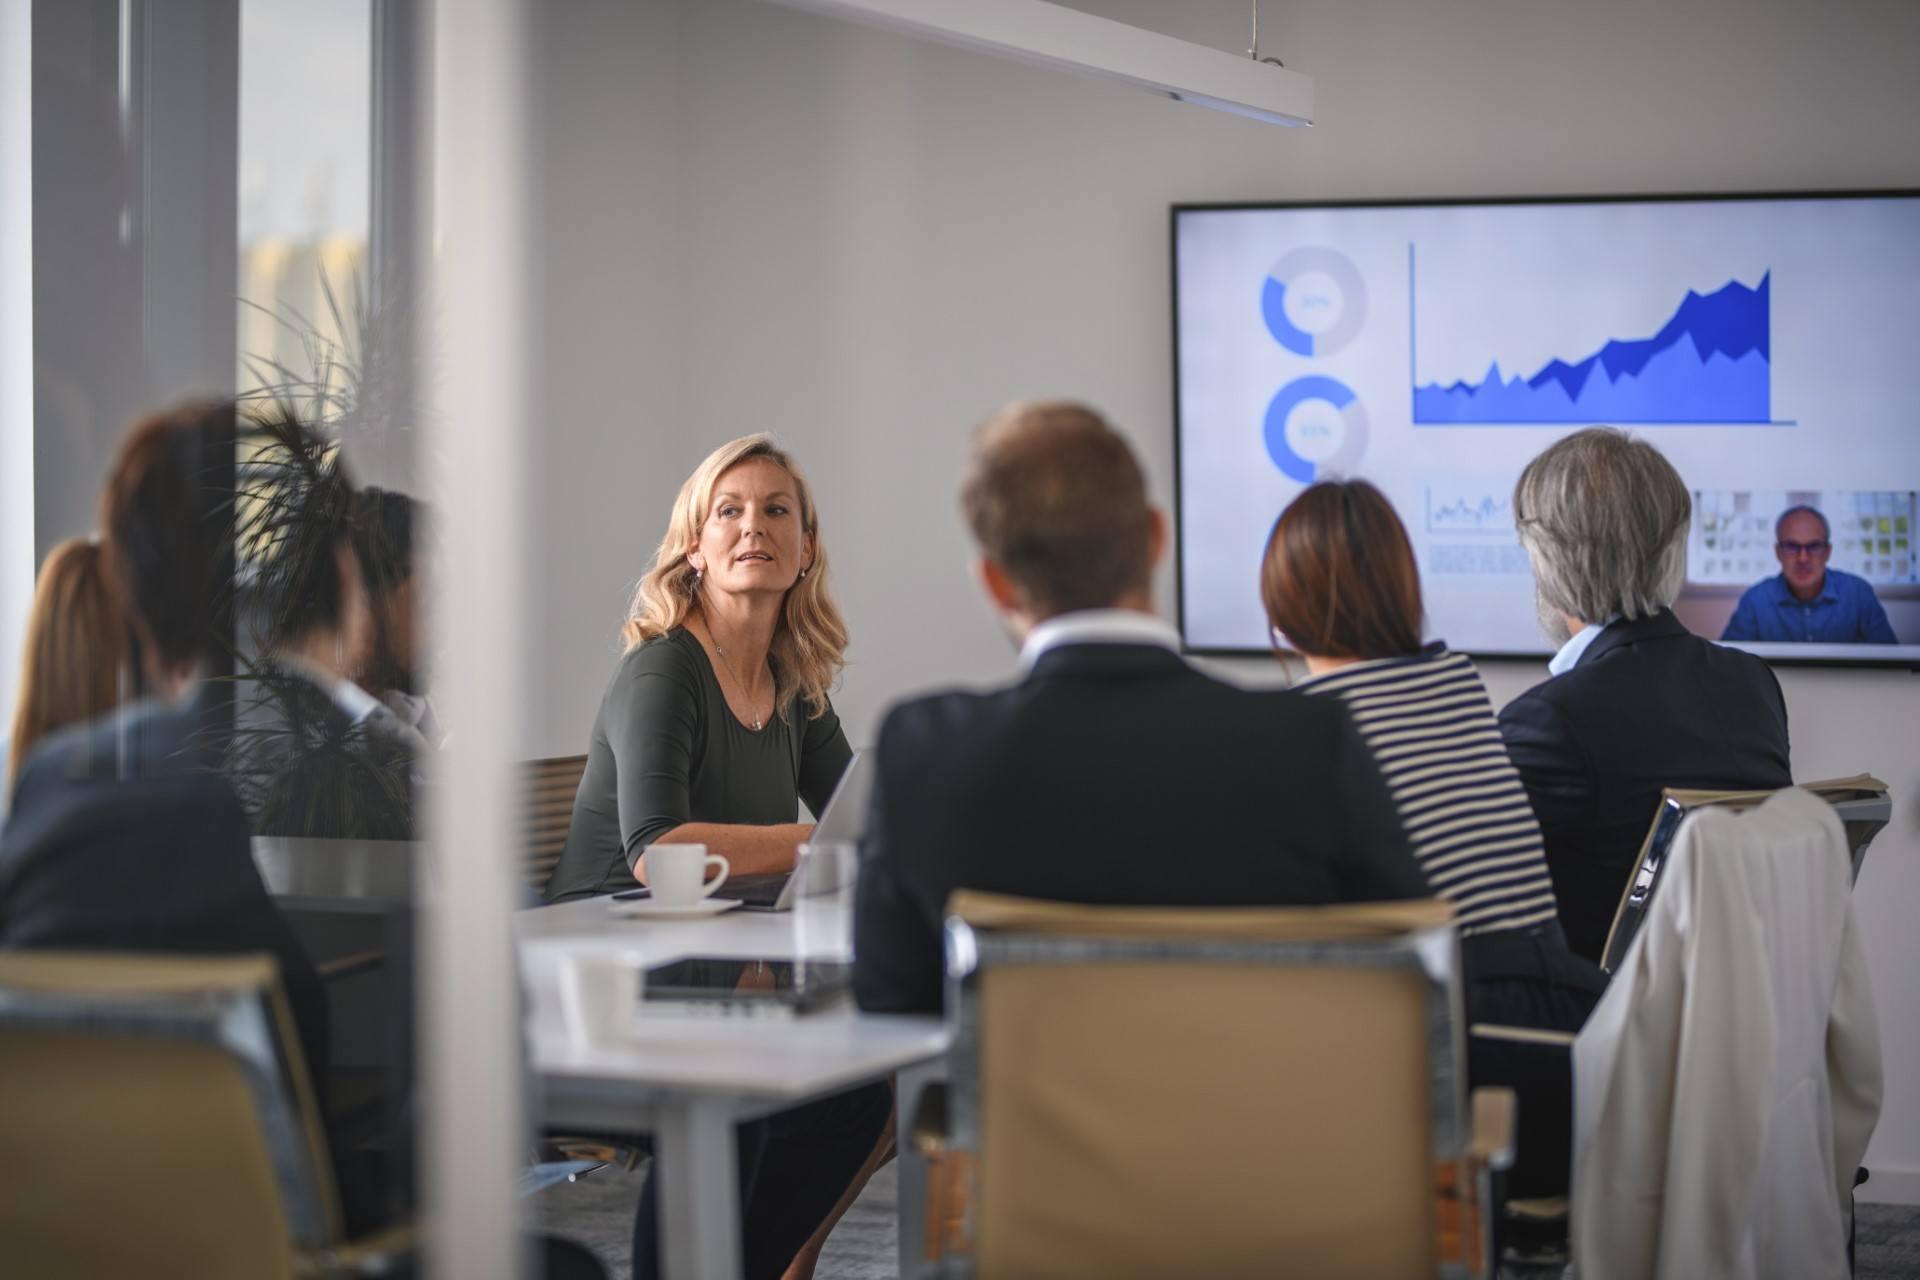 How to run an effective board meeting